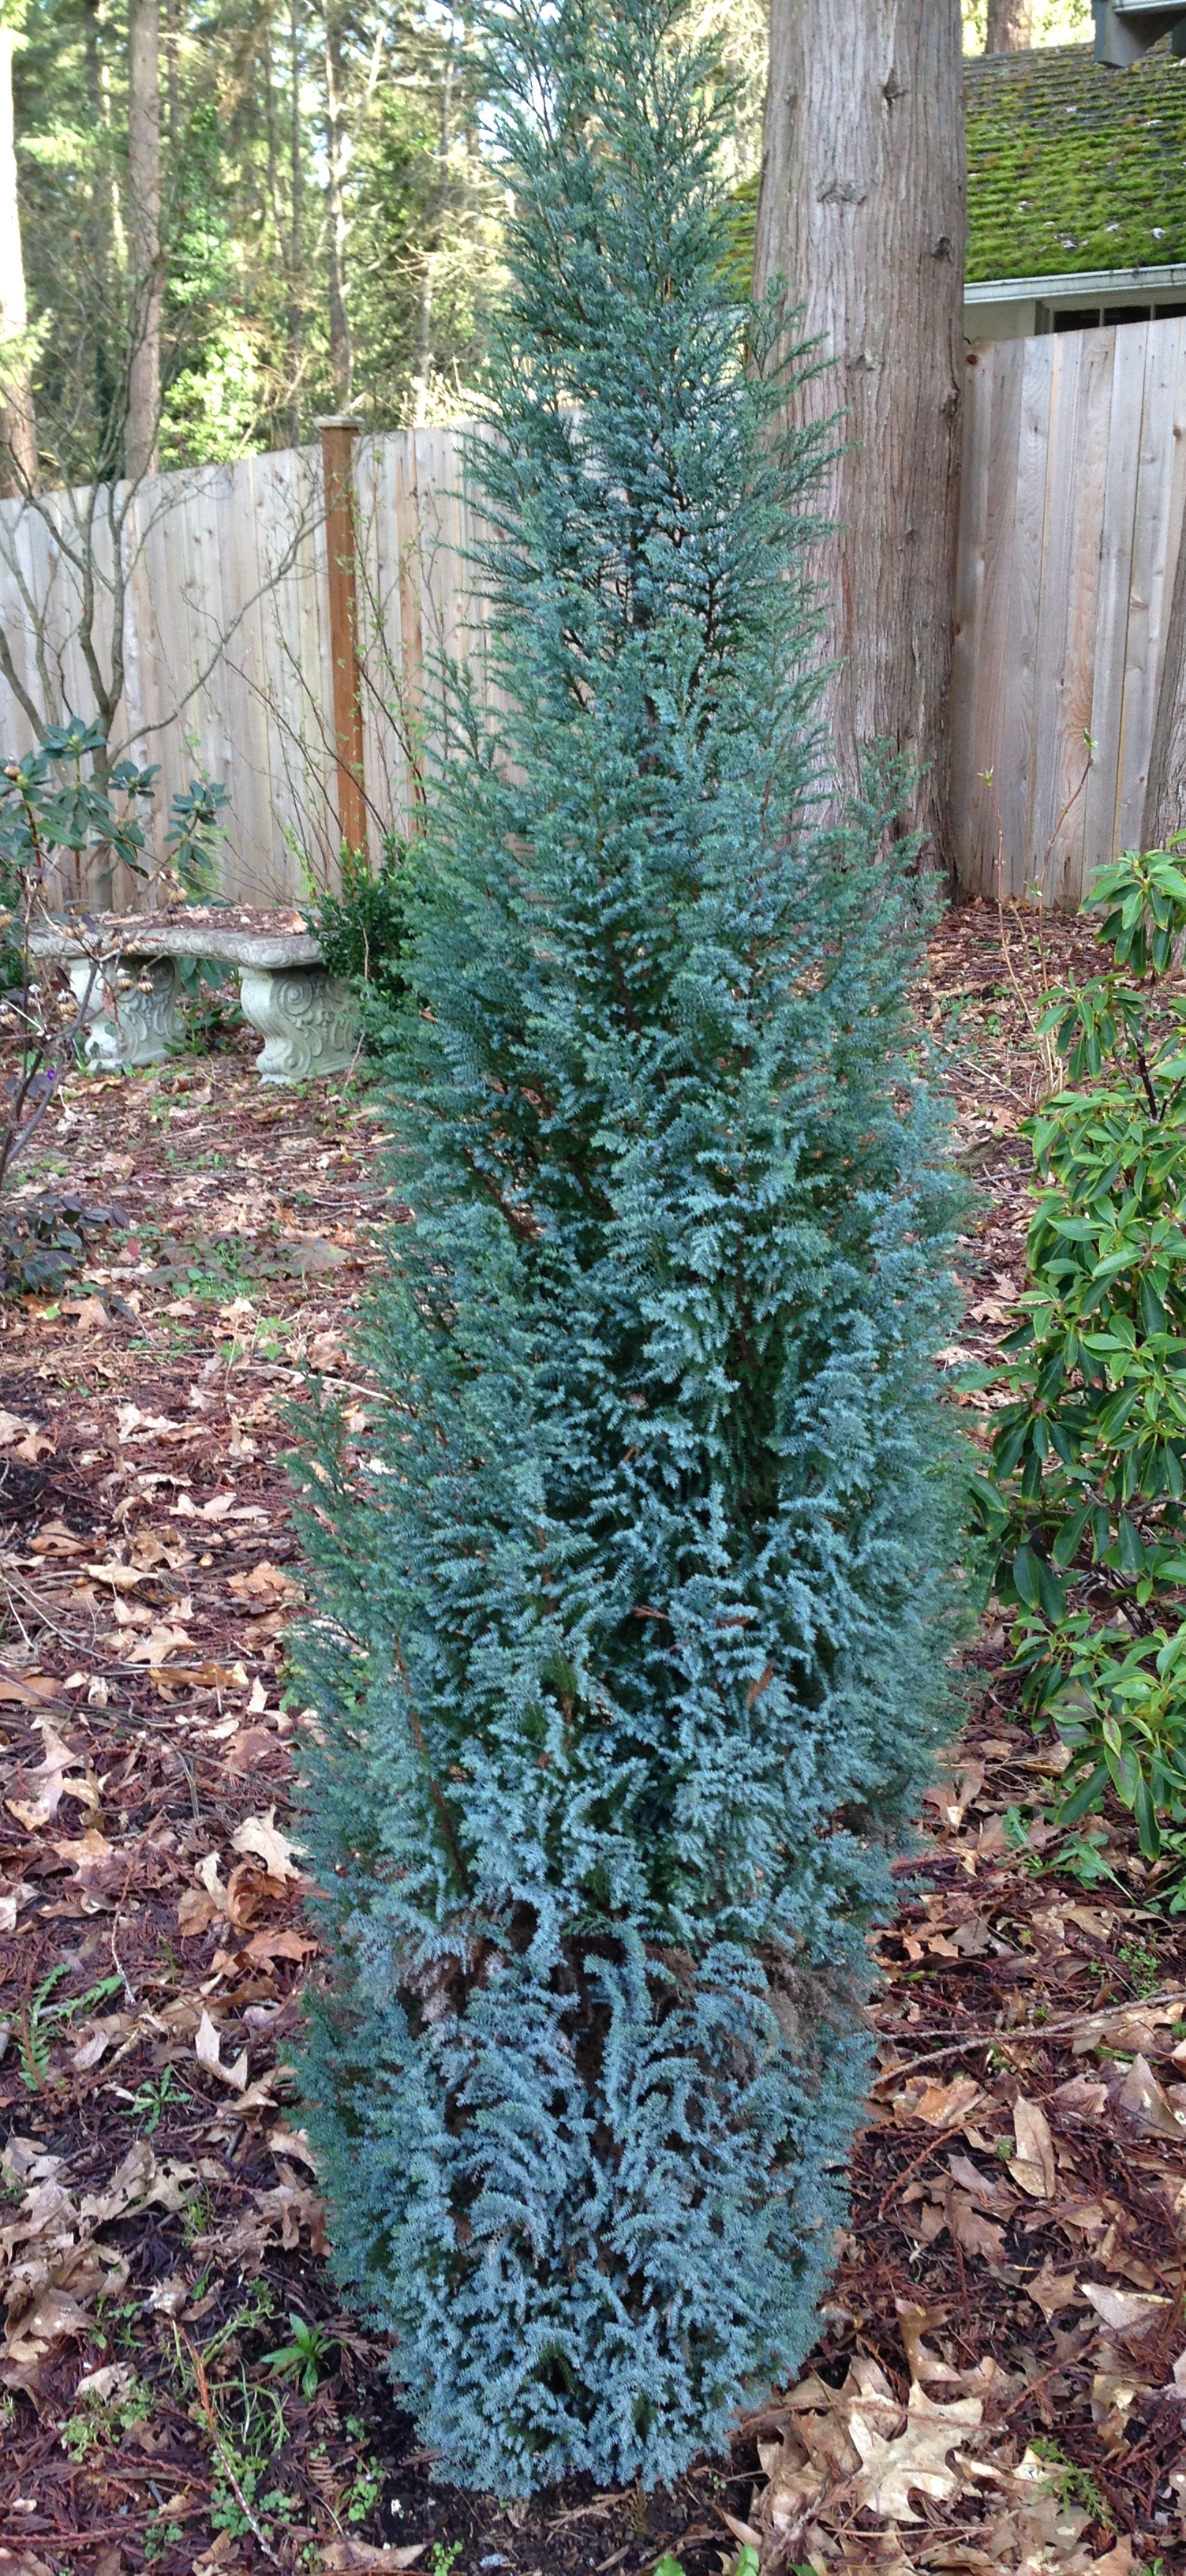 Chamaecyparis lawsoniana 'Blue Surprise'